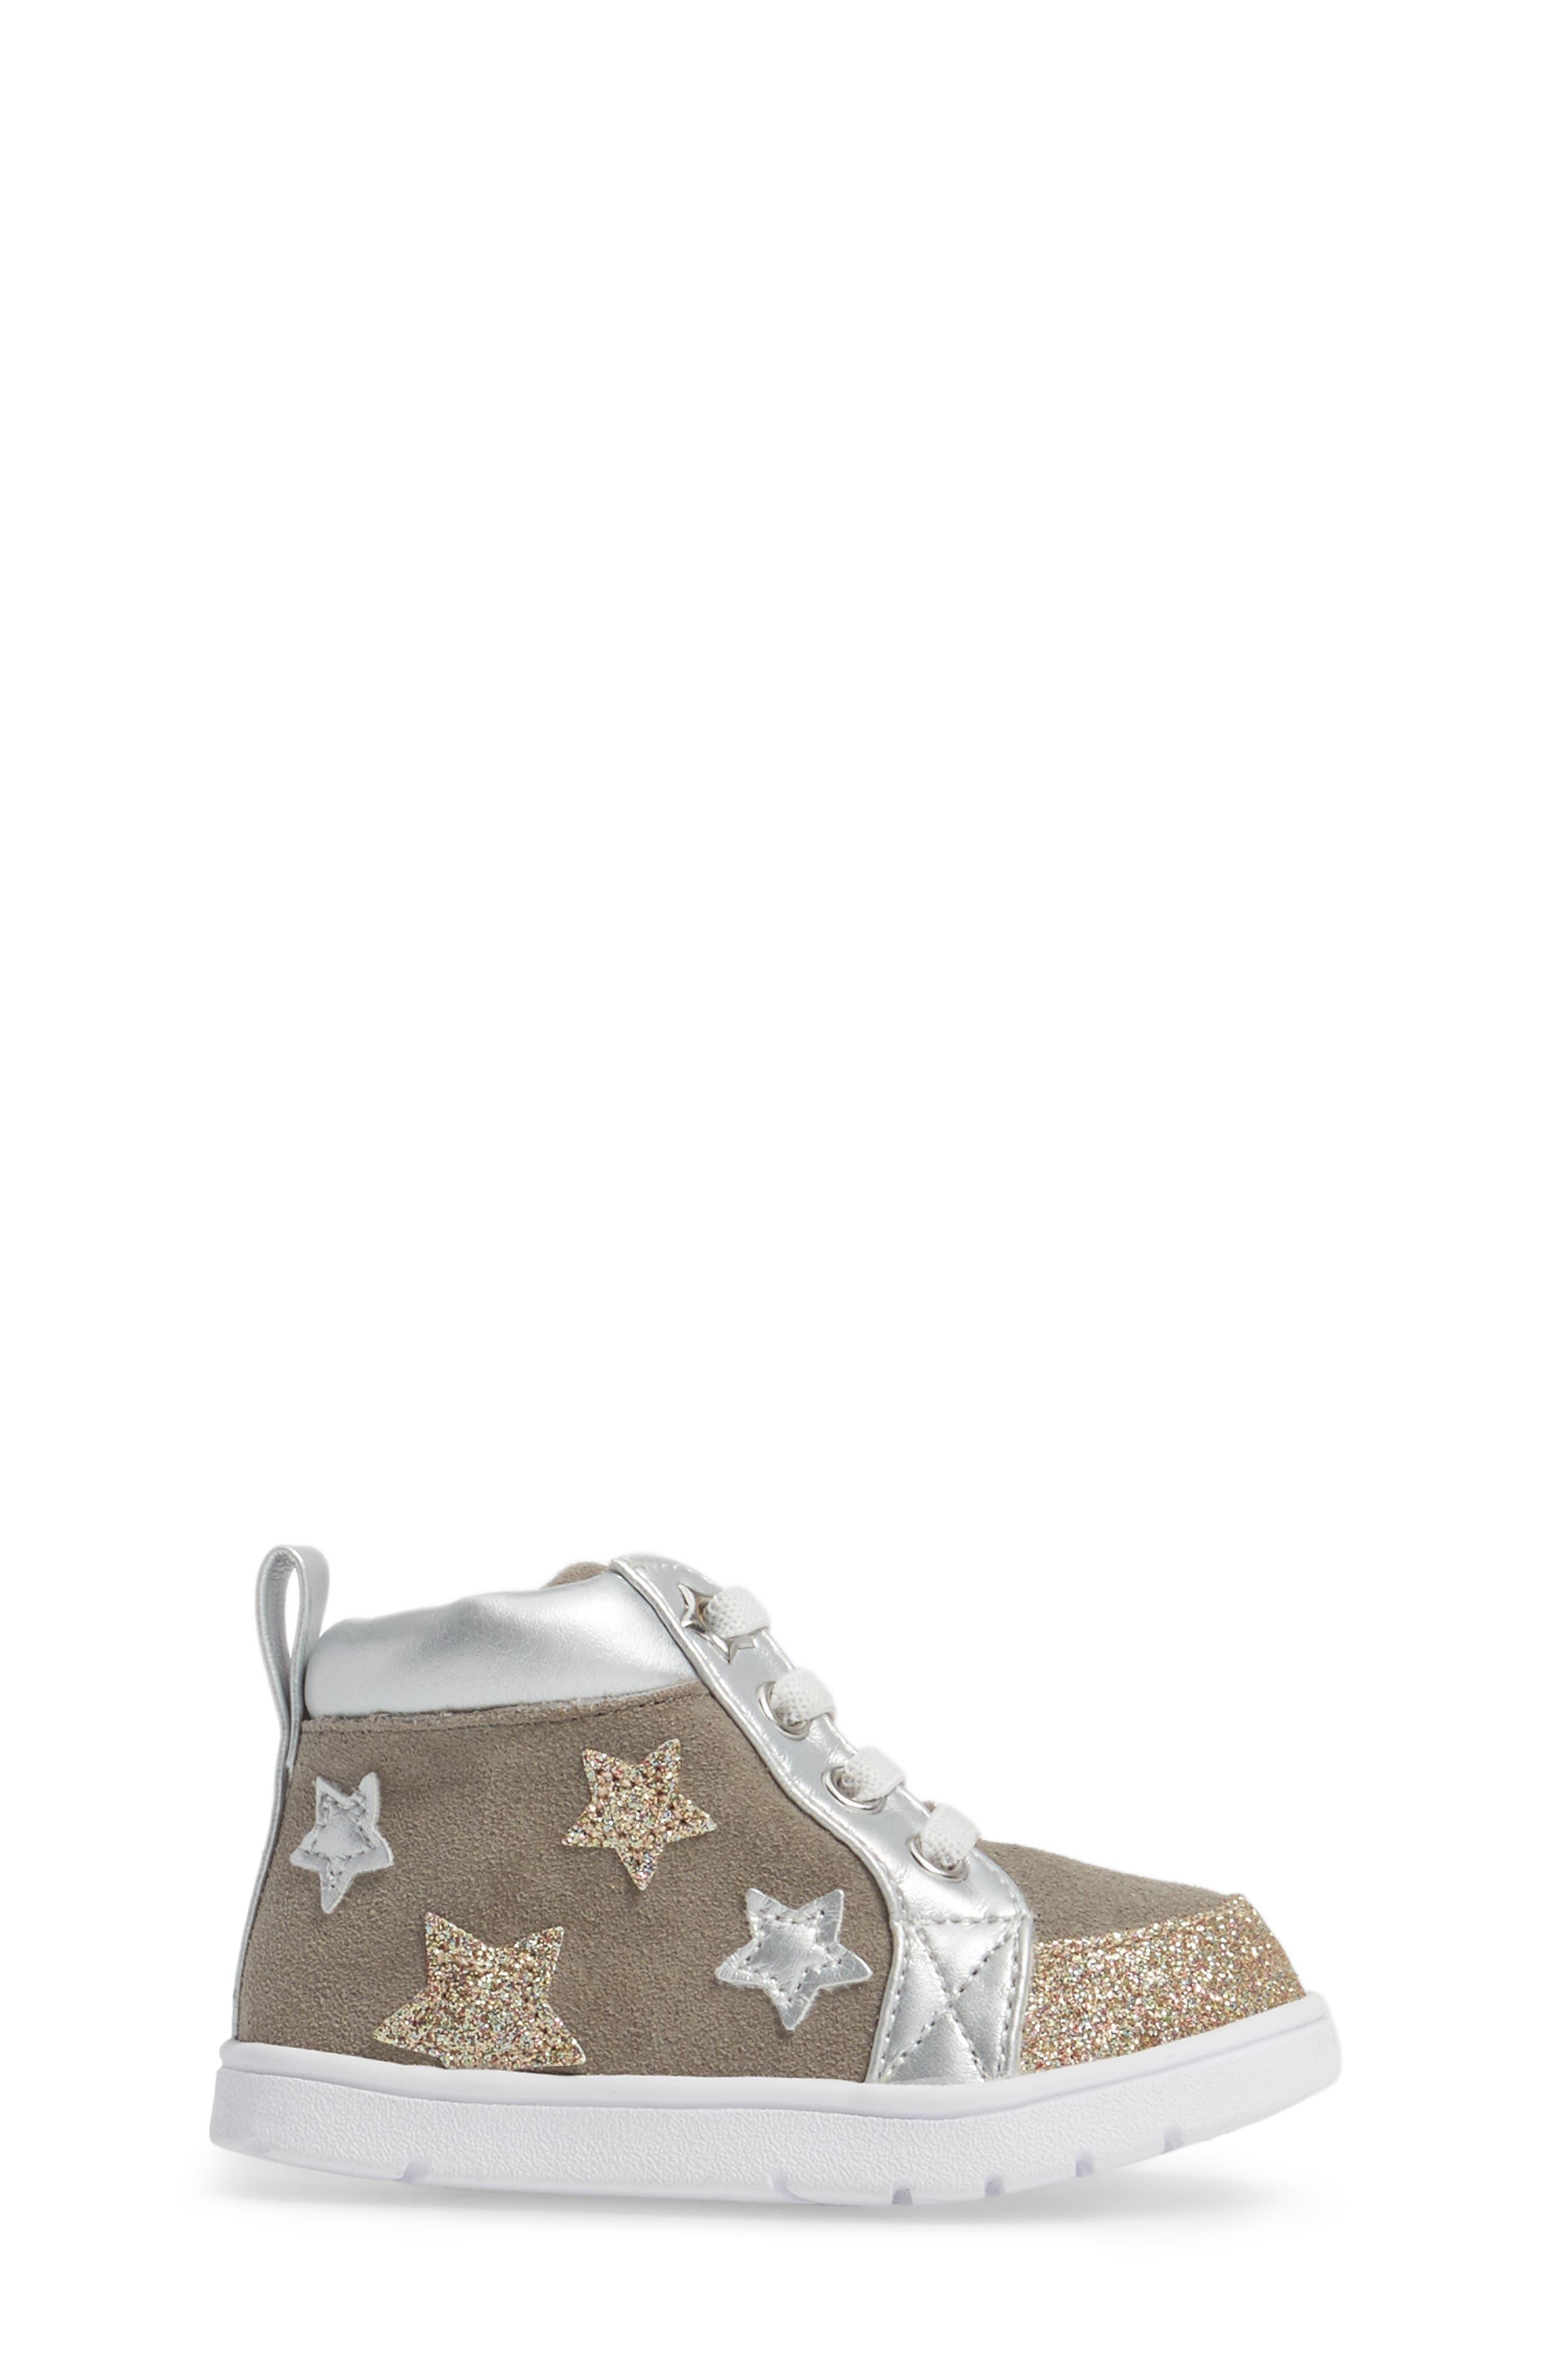 Diantha Star Appliqué High Top Sneaker,                             Alternate thumbnail 3, color,                             020